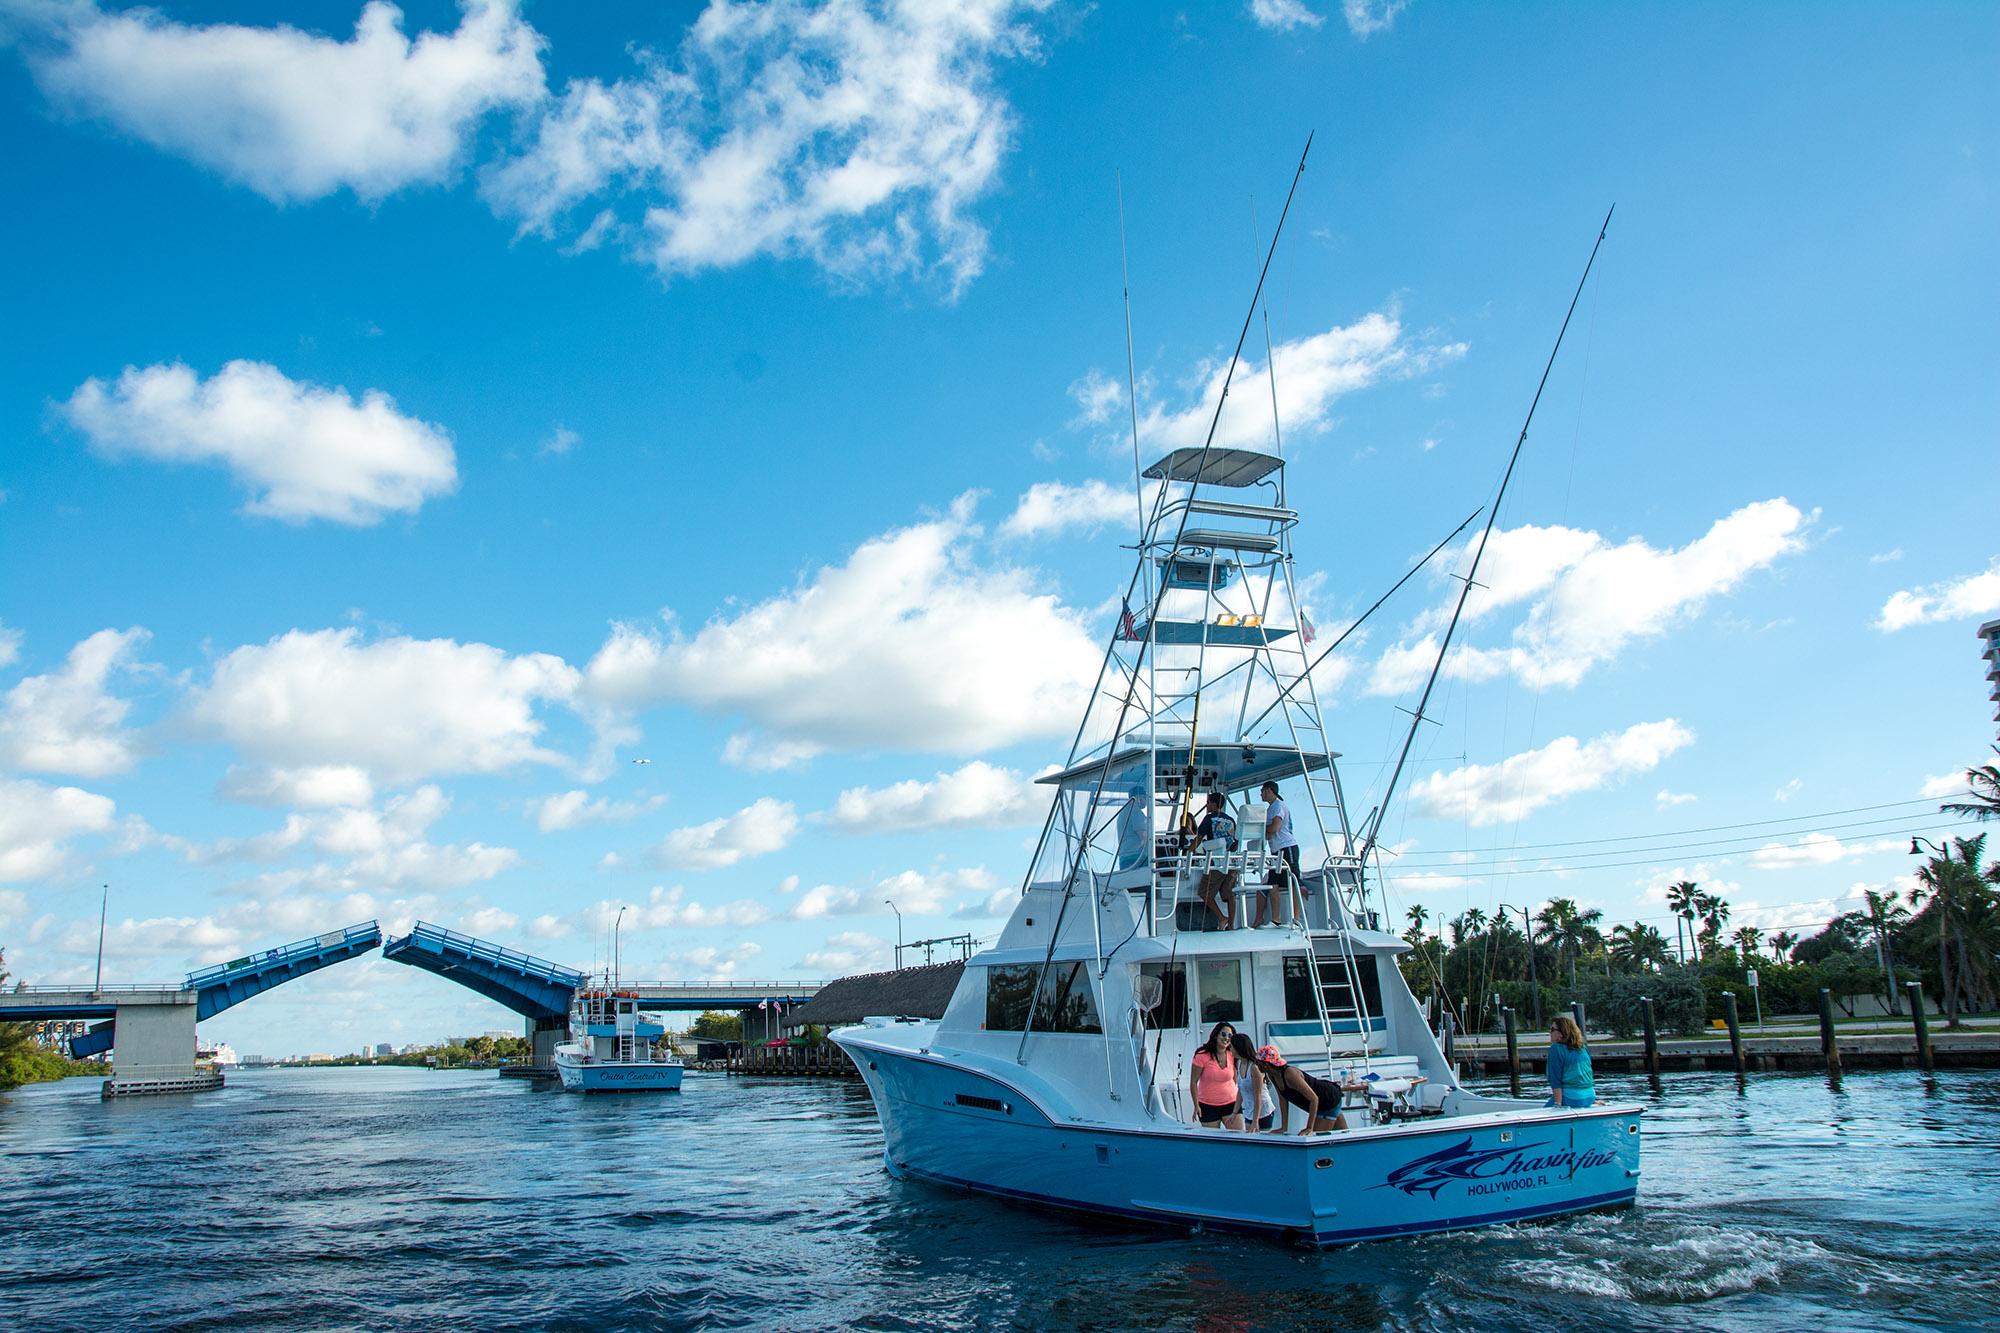 Deep sea fishing charter hollywood fl chasin finz for Florida deep sea fishing